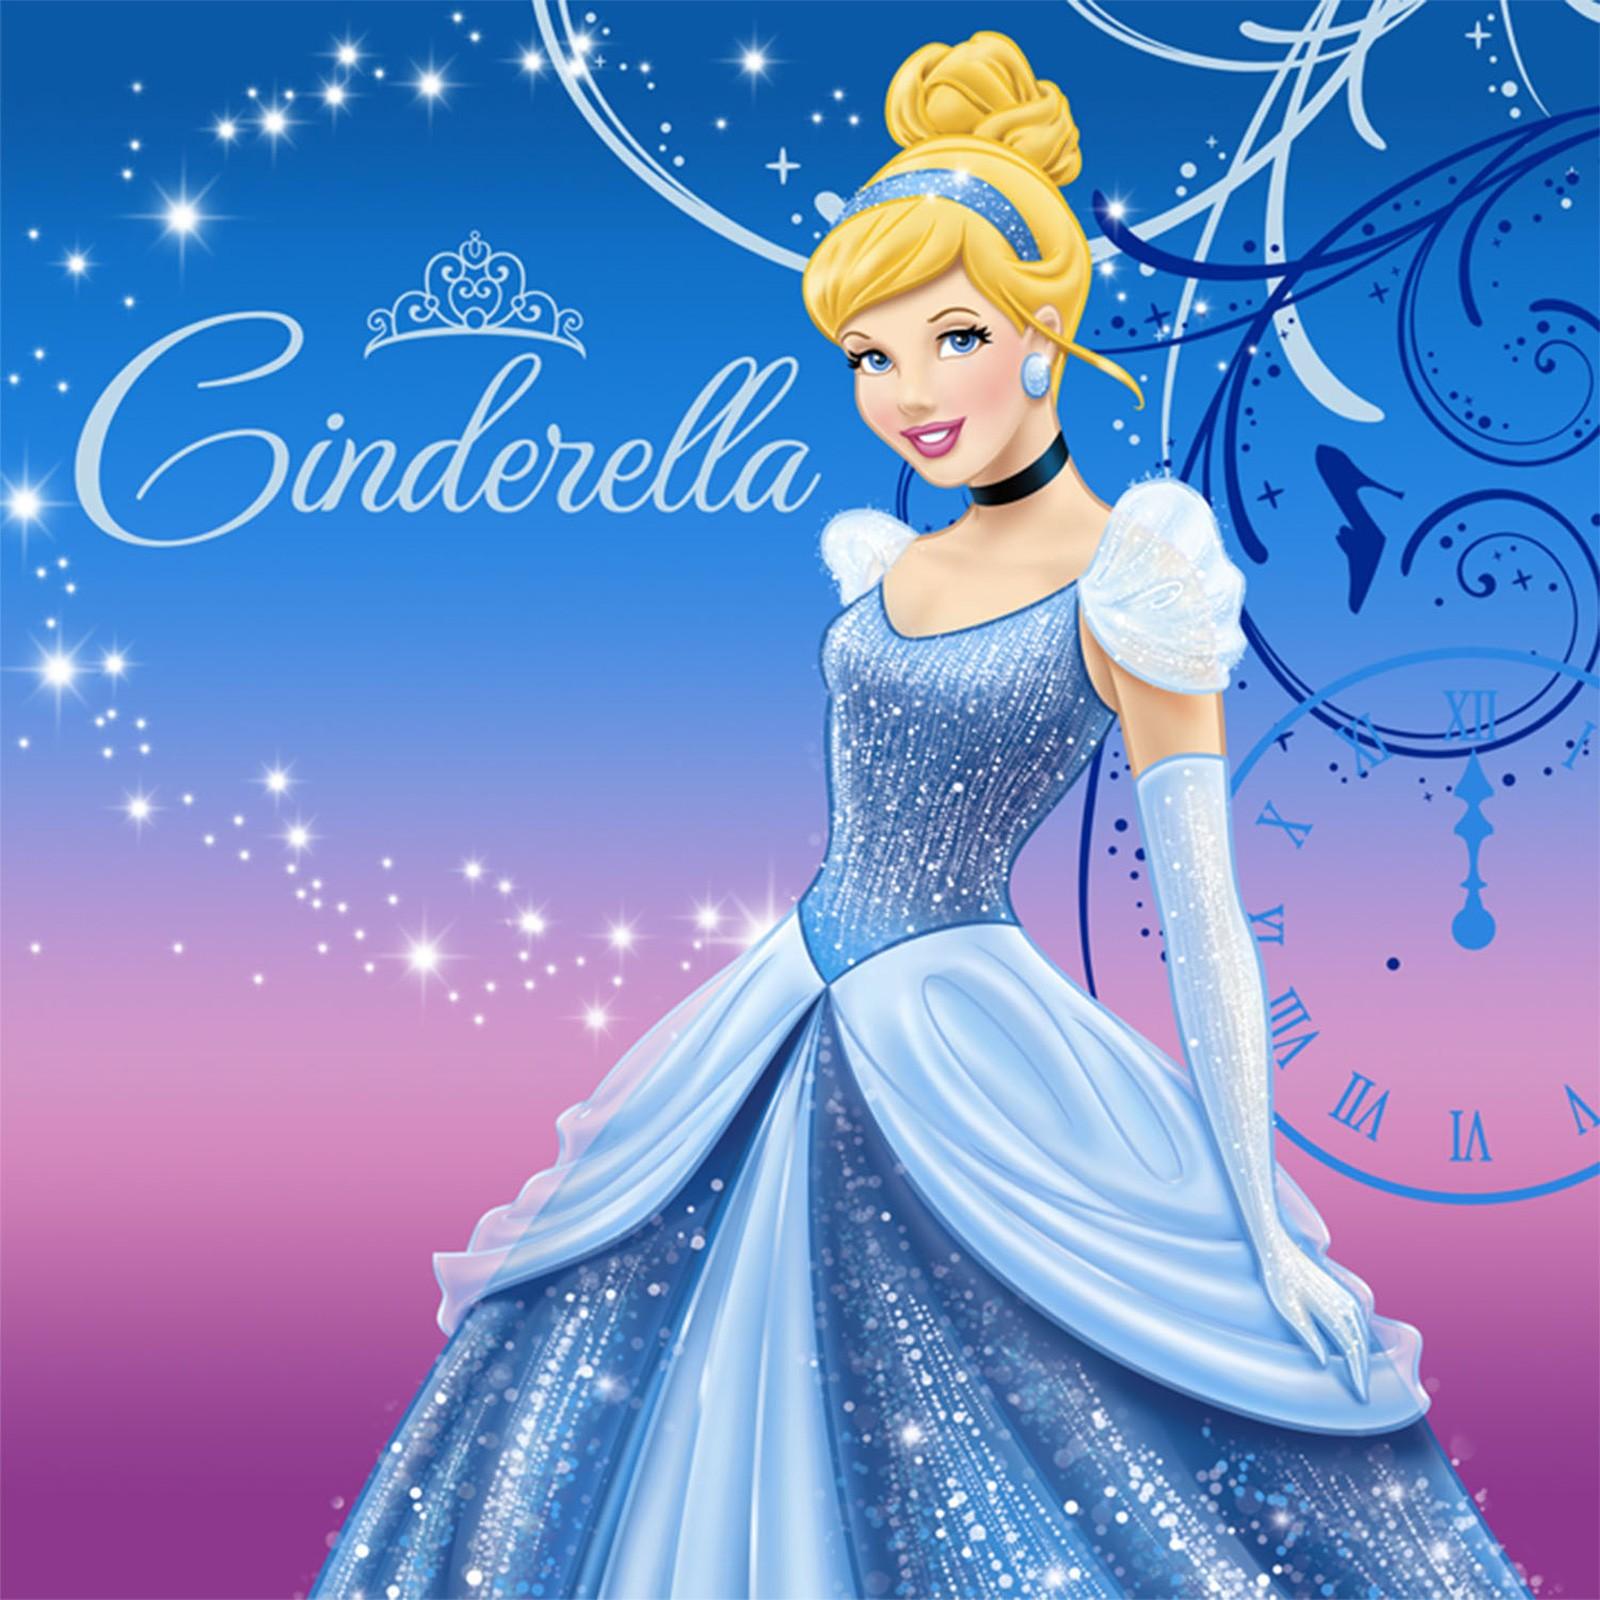 Cinderella Backgrounds, Compatible - PC, Mobile, Gadgets| 1600x1600 px